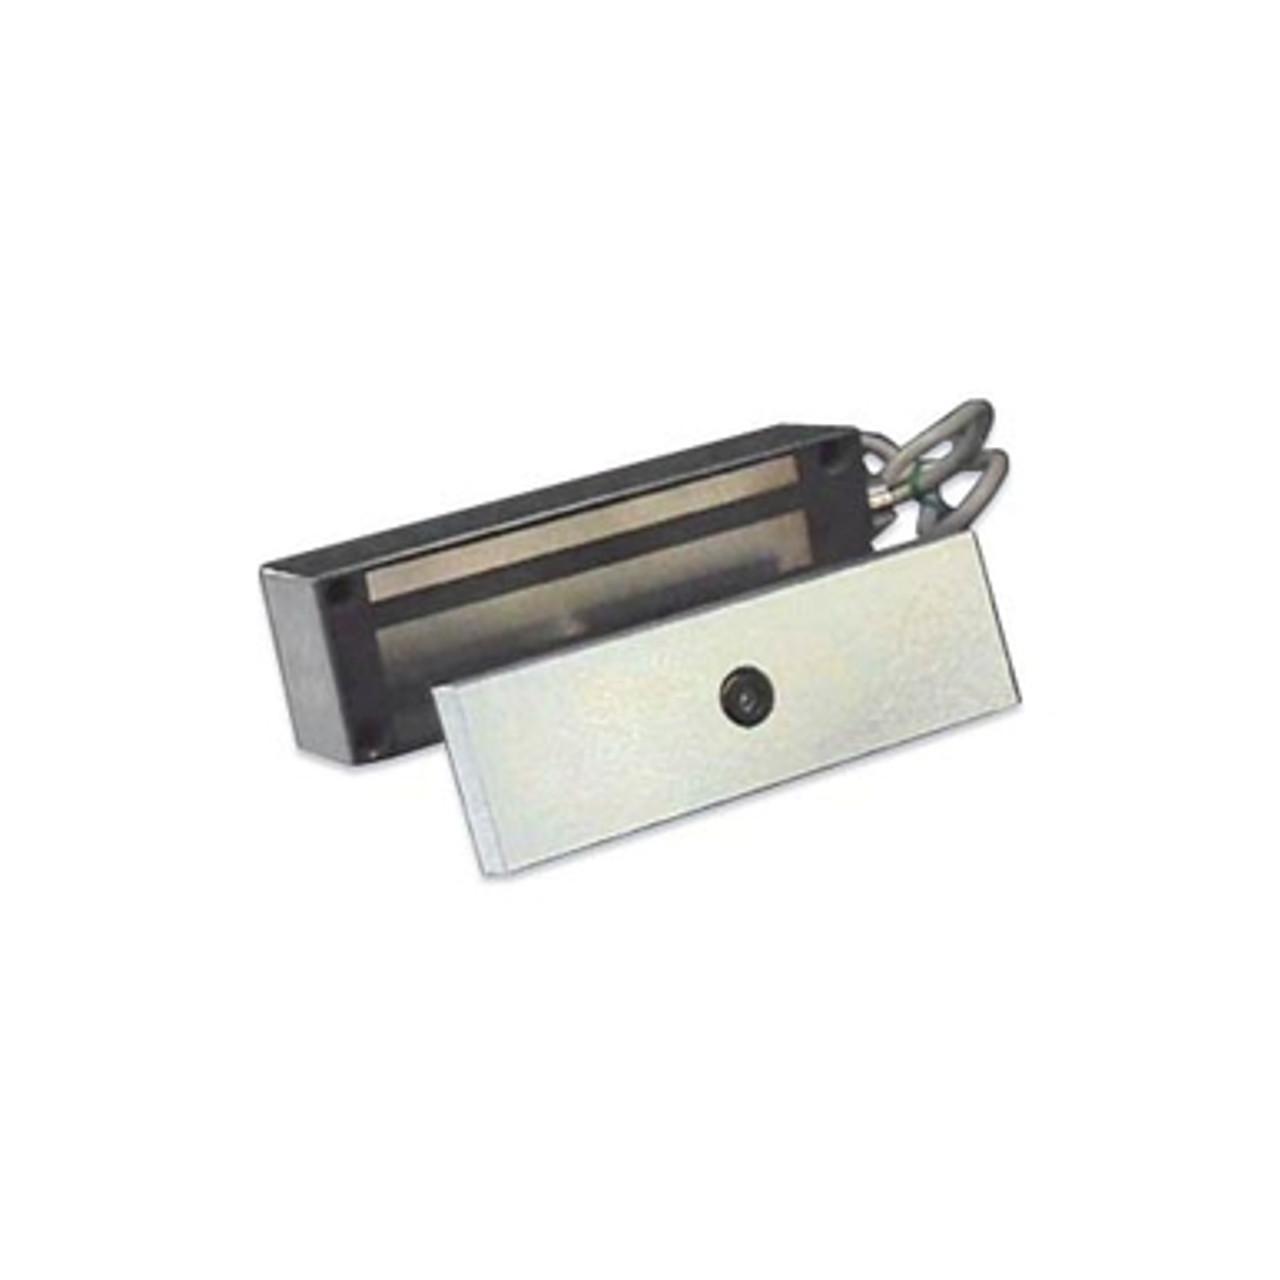 12V DC// 24V DC Rofu 2960 Fail Safe Electromechanical Mortise Lock